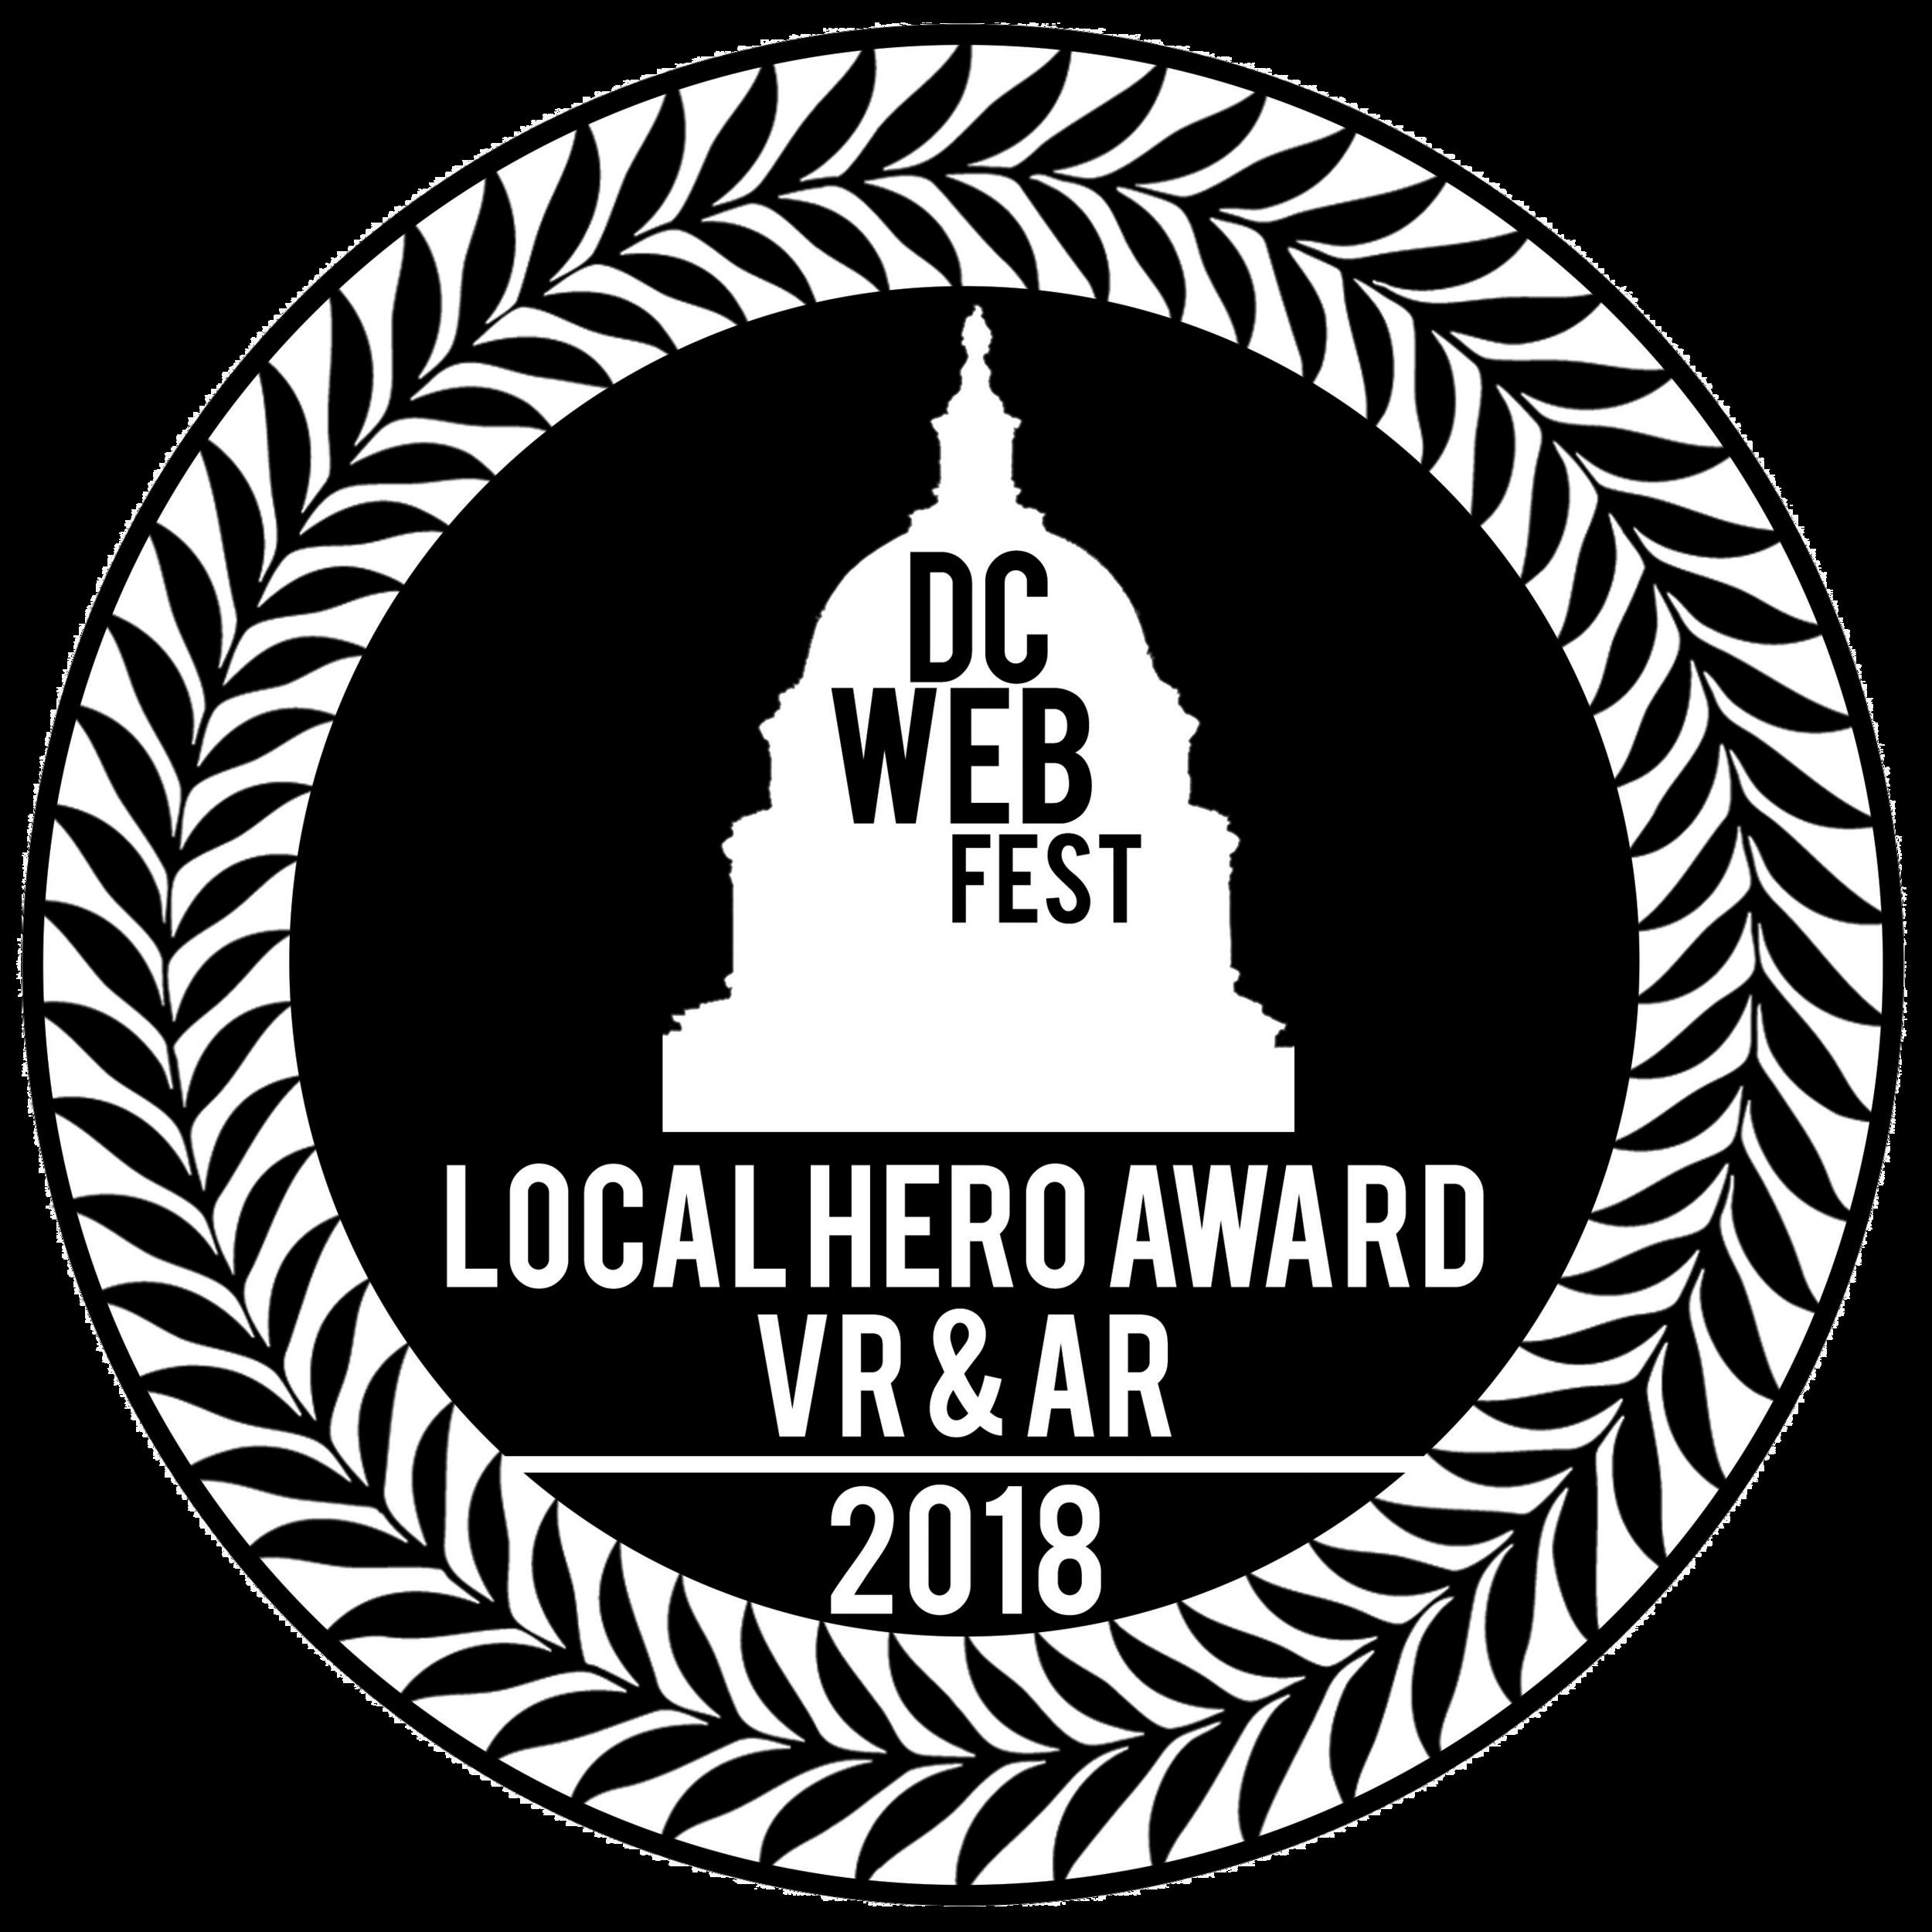 """Local Hero Award in VR & AR"" DC Web Fest 2018"